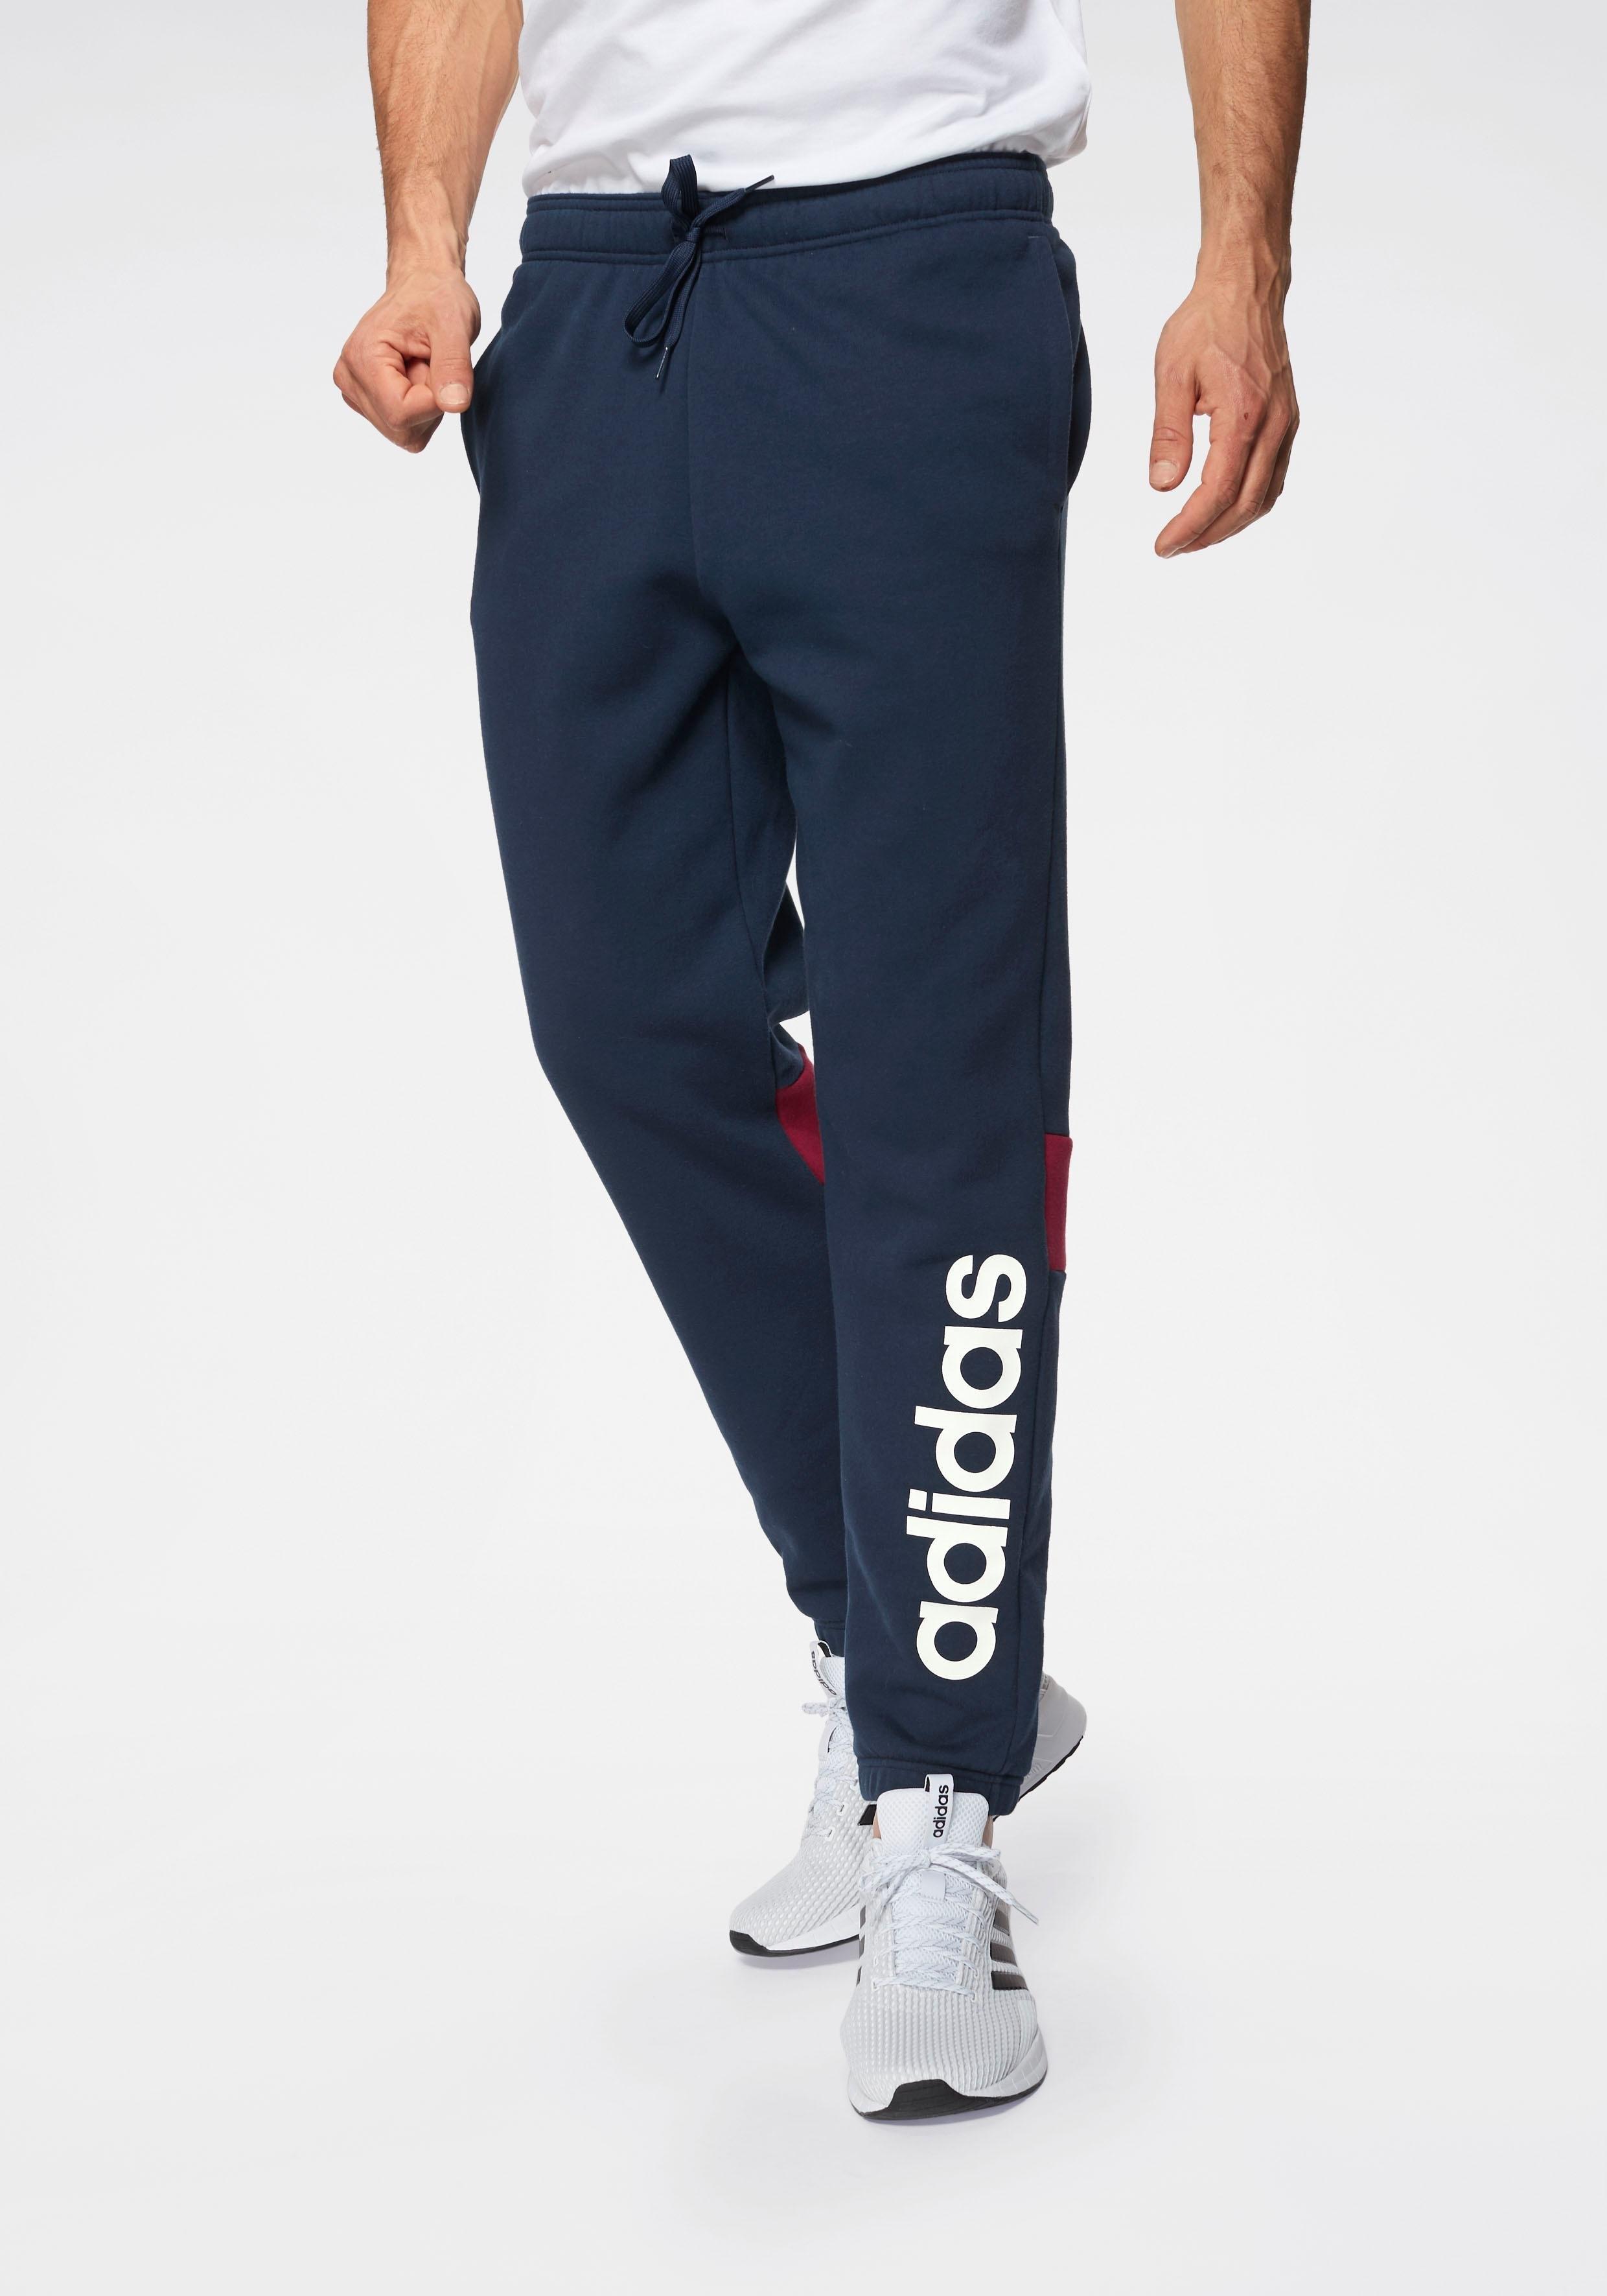 adidas Performance adidas joggingbroek »OSR M TR PANT« - verschillende betaalmethodes